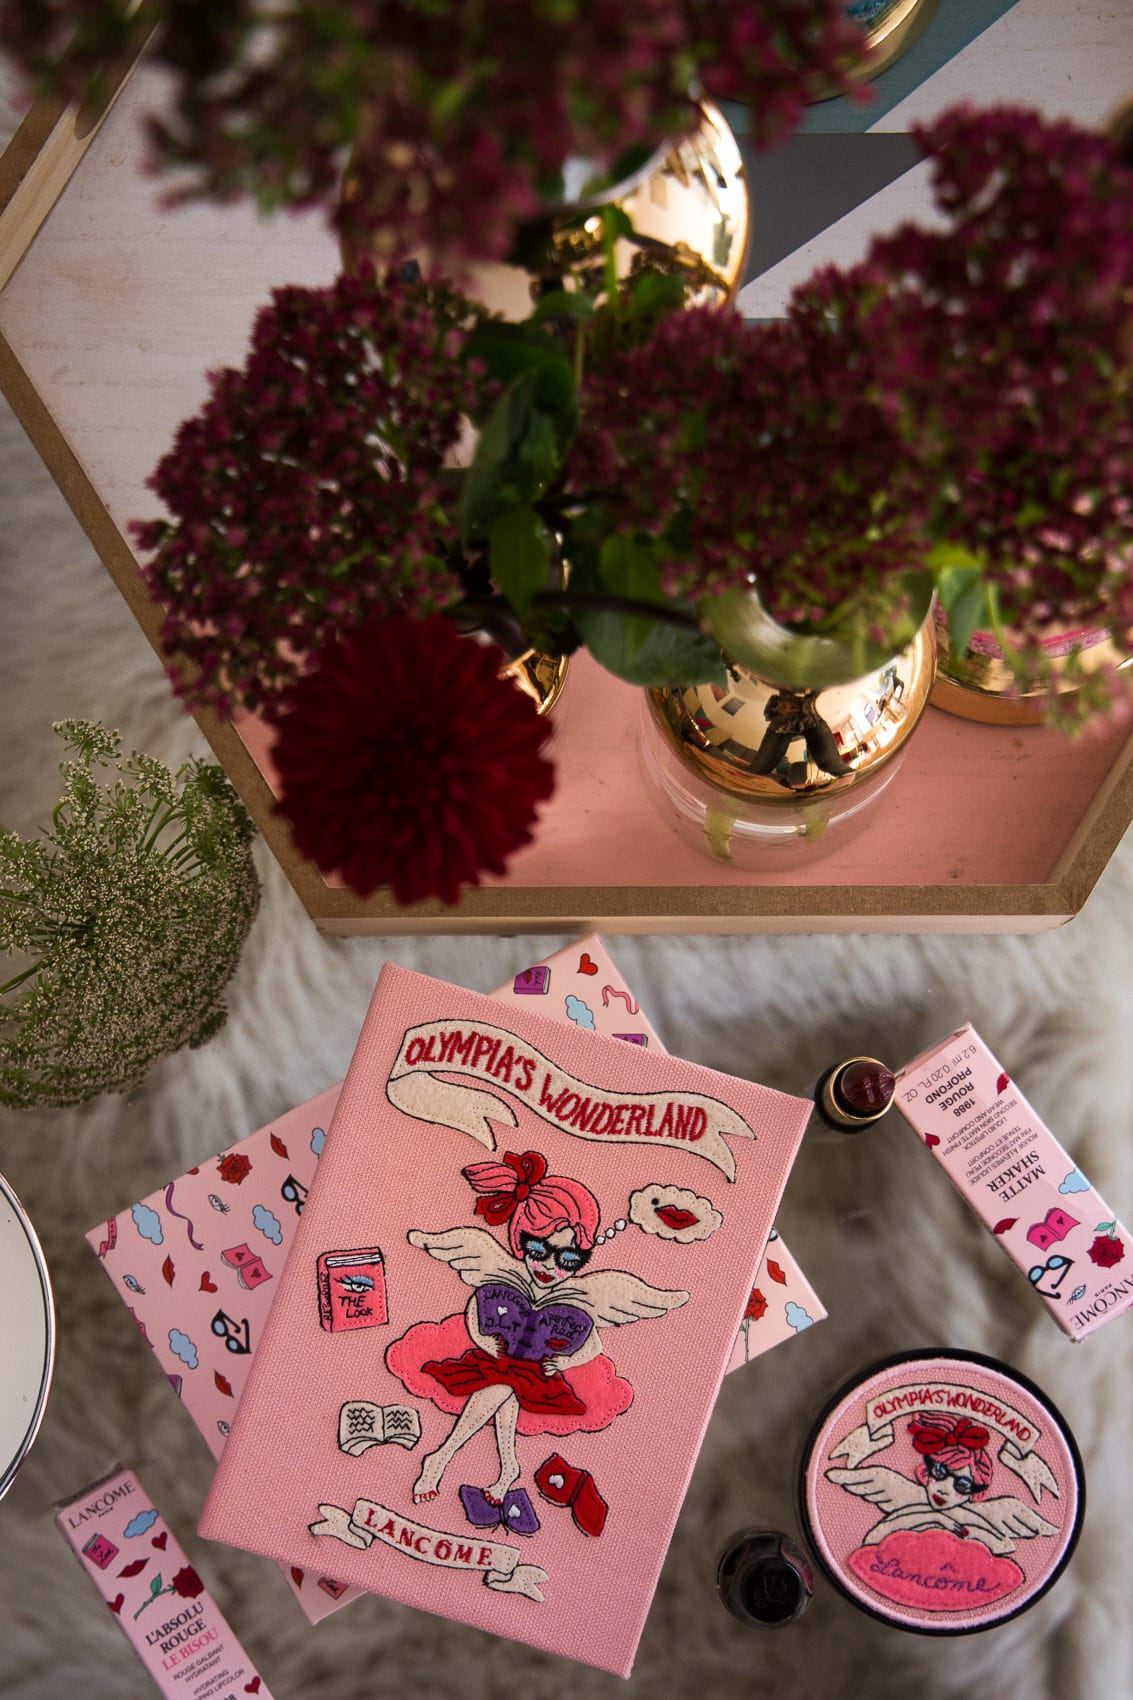 LANCÔME Herbst Limited Edition 2017: Olympia's Wonderland